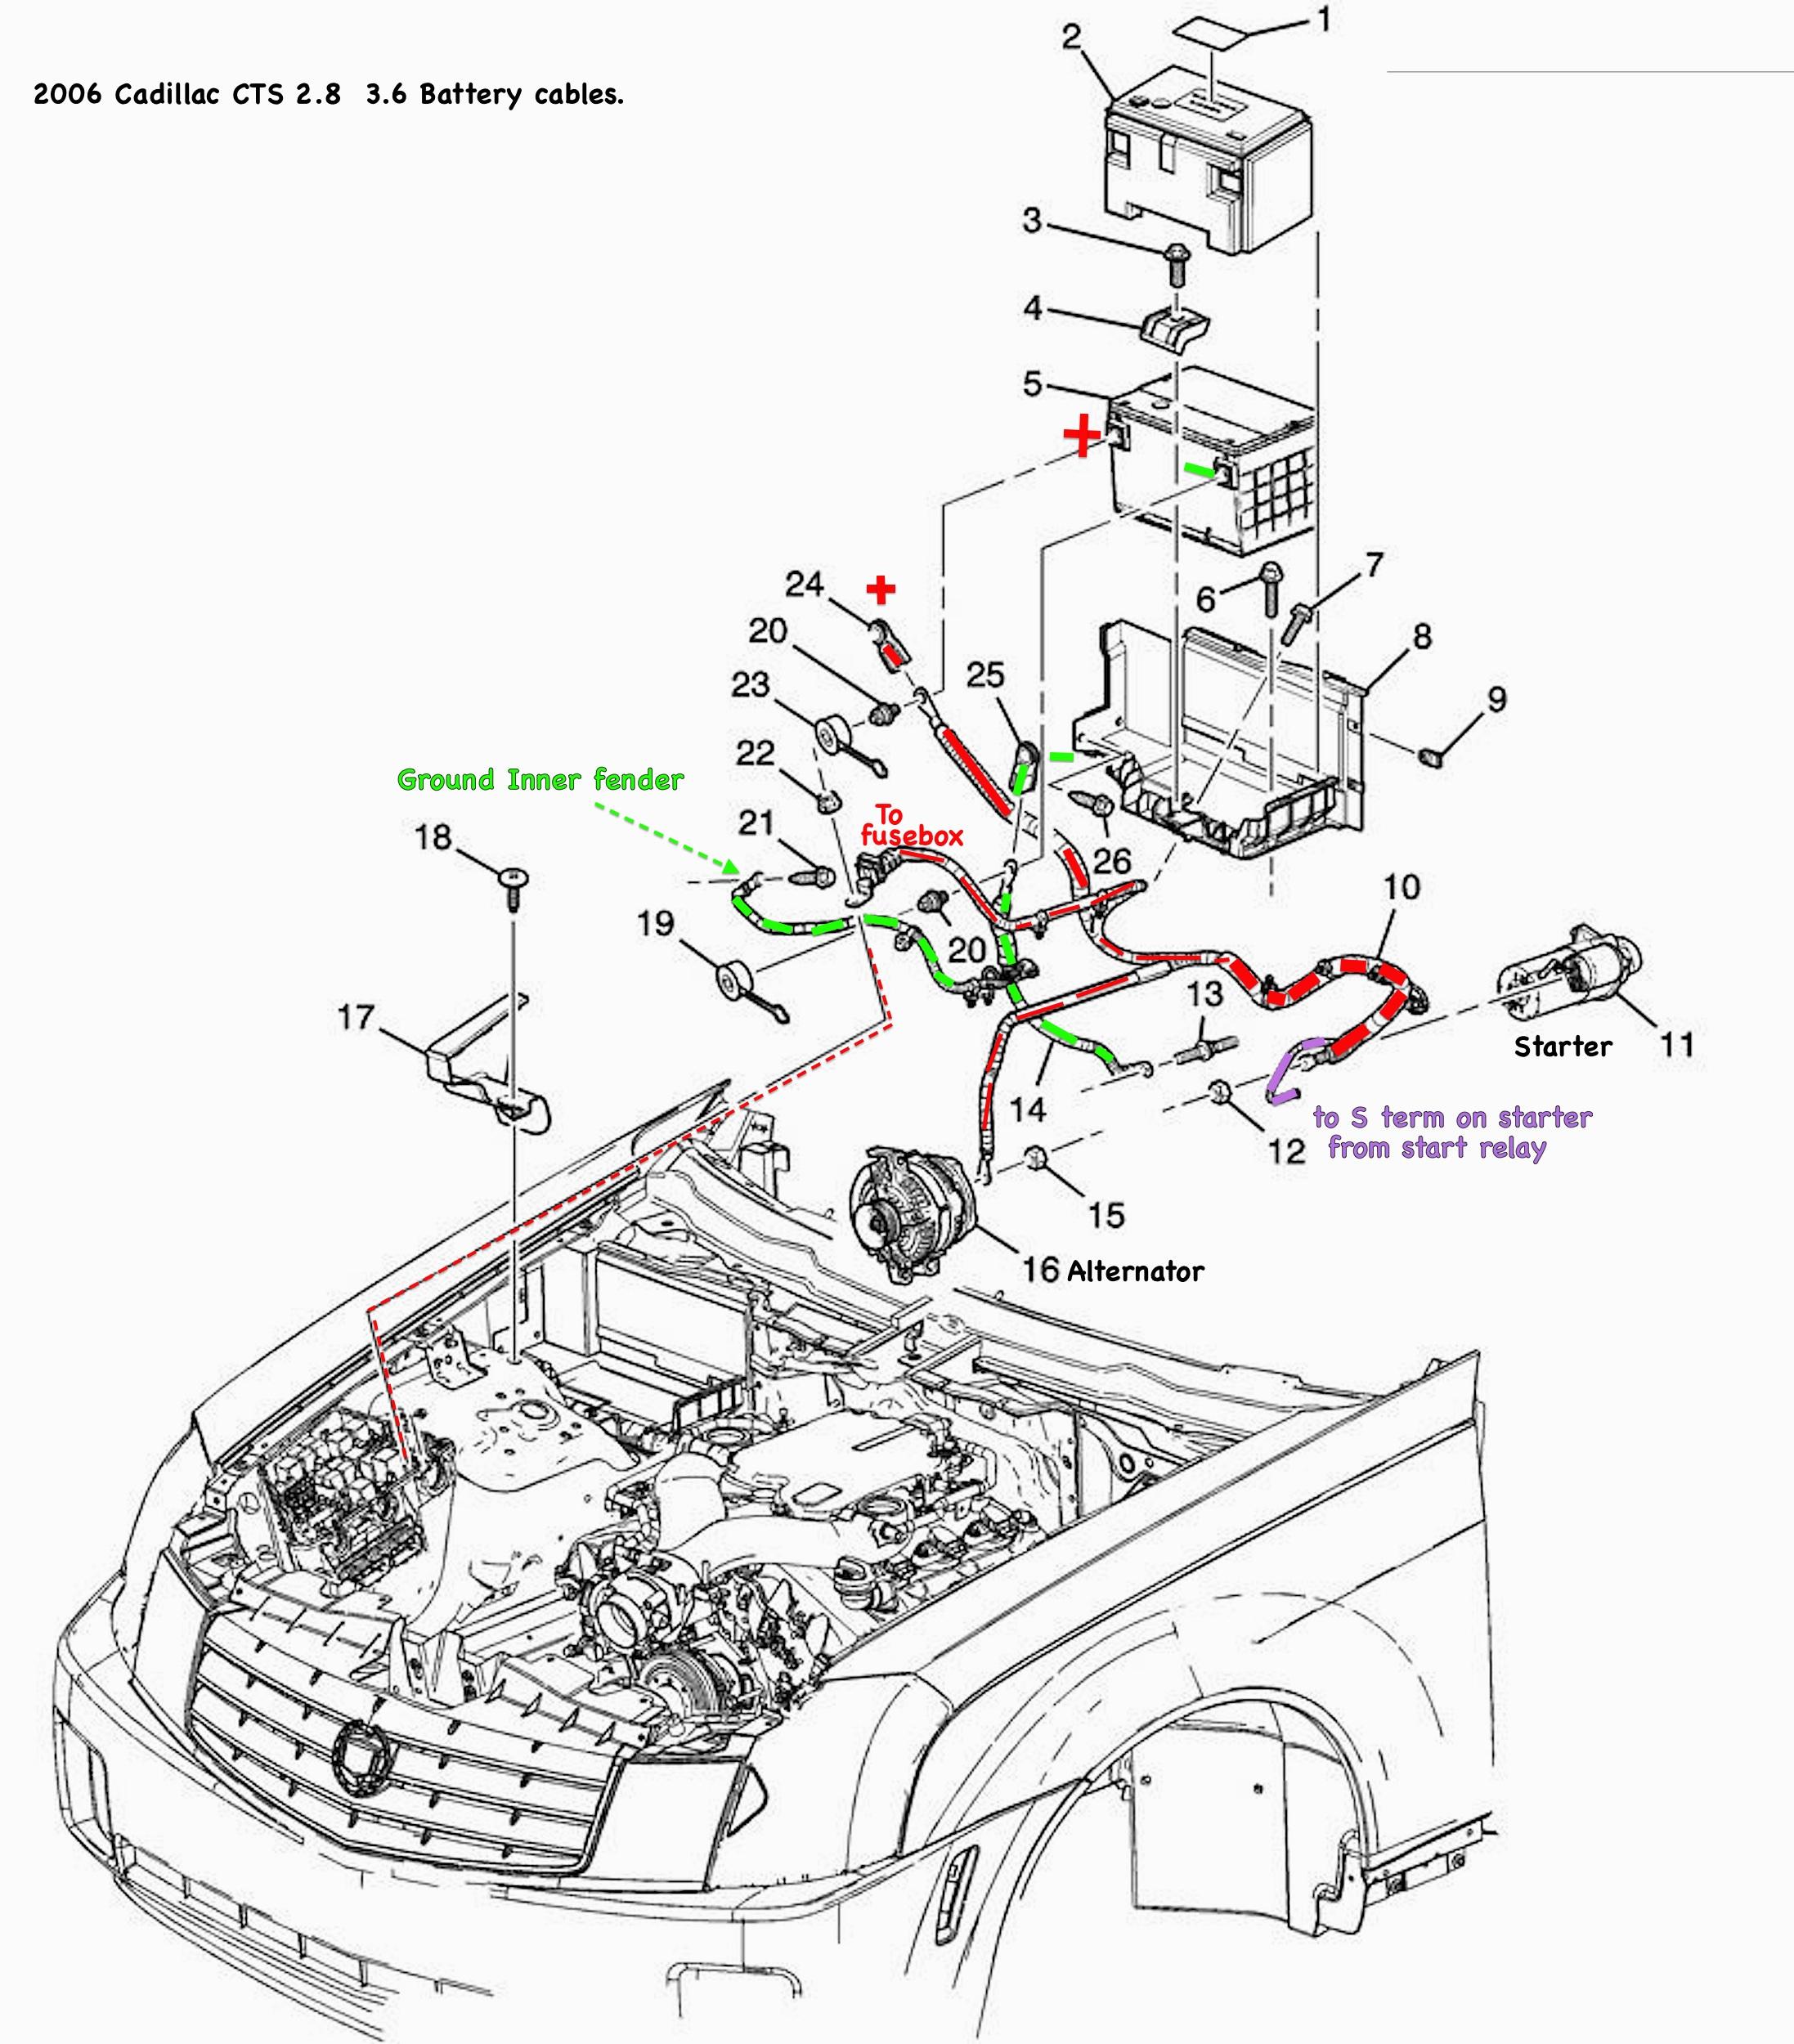 [MF_4639] 2006 Cadillac Cts Engine Diagram Free Diagram